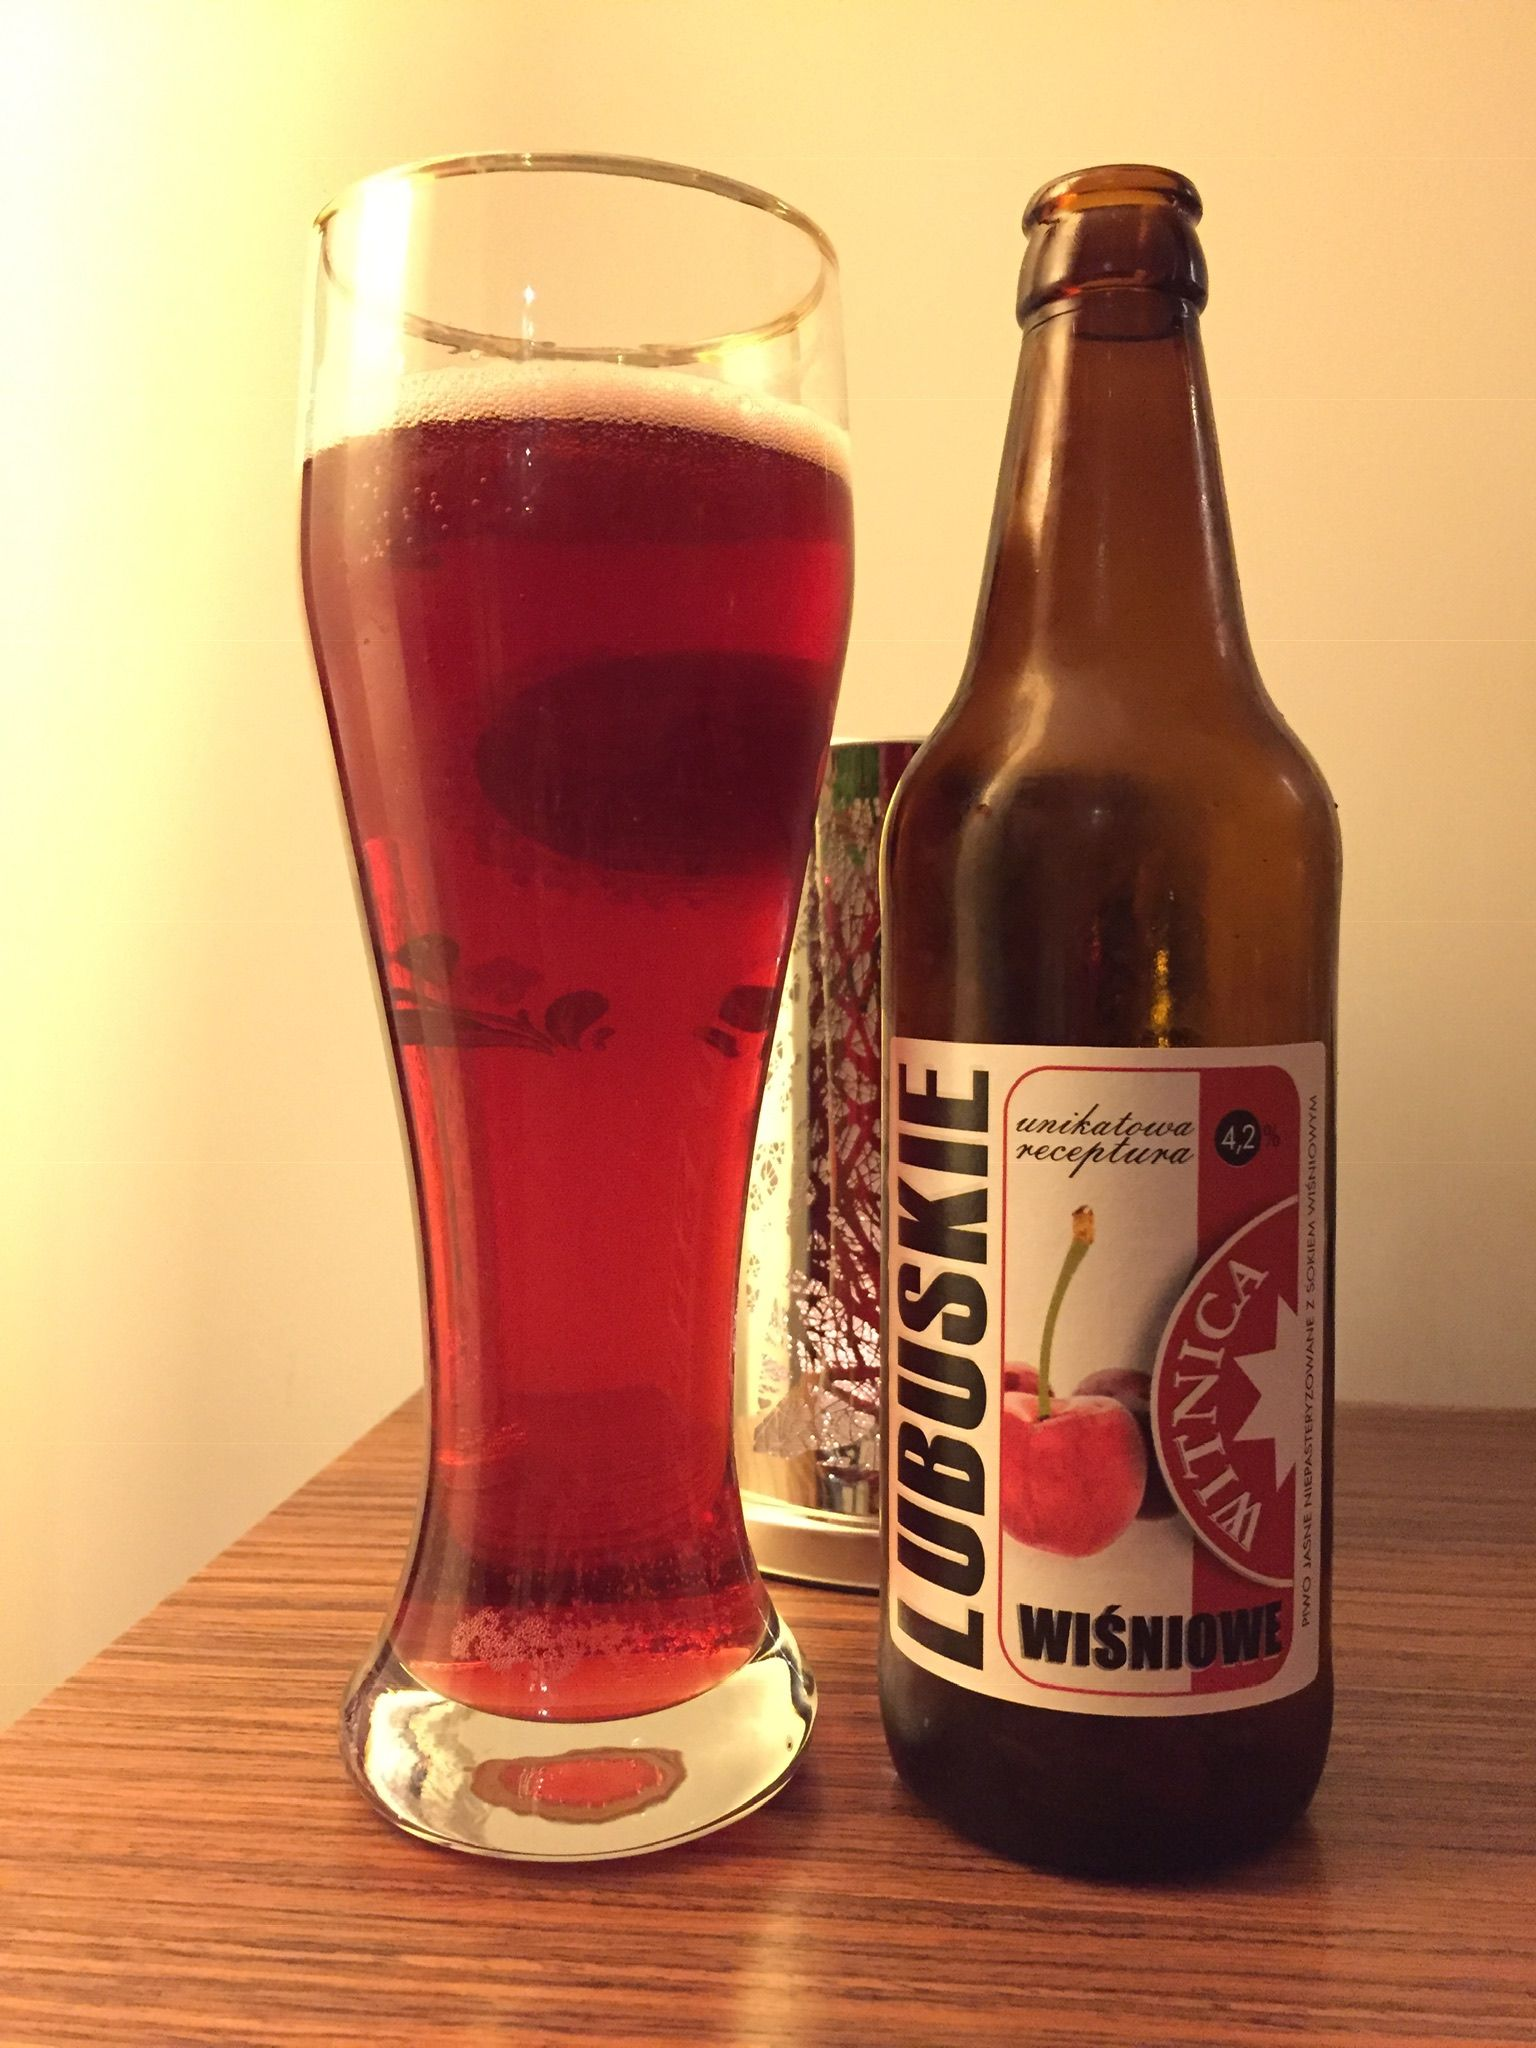 Lubuskie Wisniowe Browar Witnica 2018 12 09 Beer Beers Of The World Alcoholic Drinks